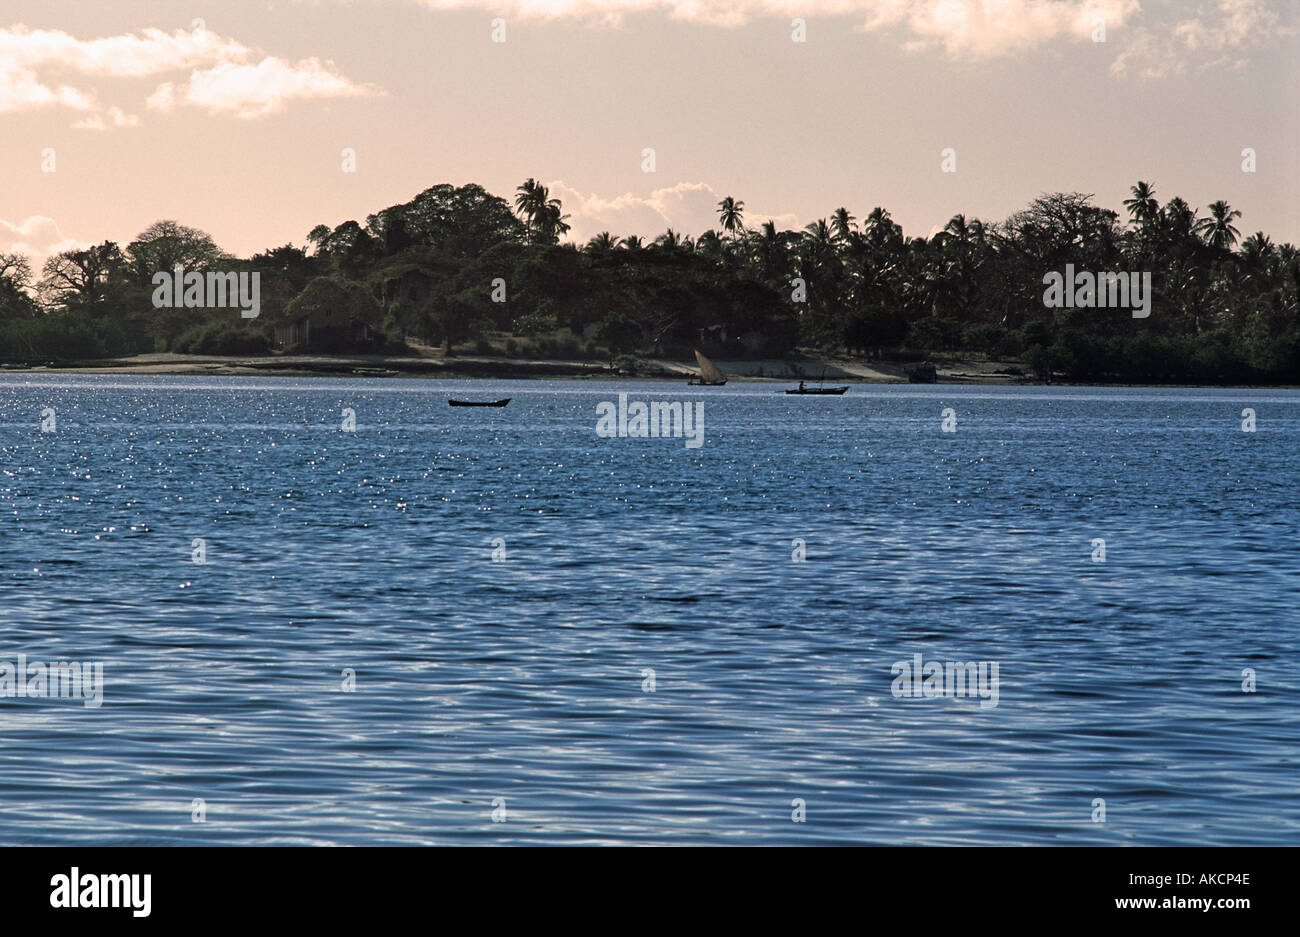 Local boats in the straits between Mafia island and Chole island s of Zanzibar Tanzania Viewed from Utende Mafia - Stock Image